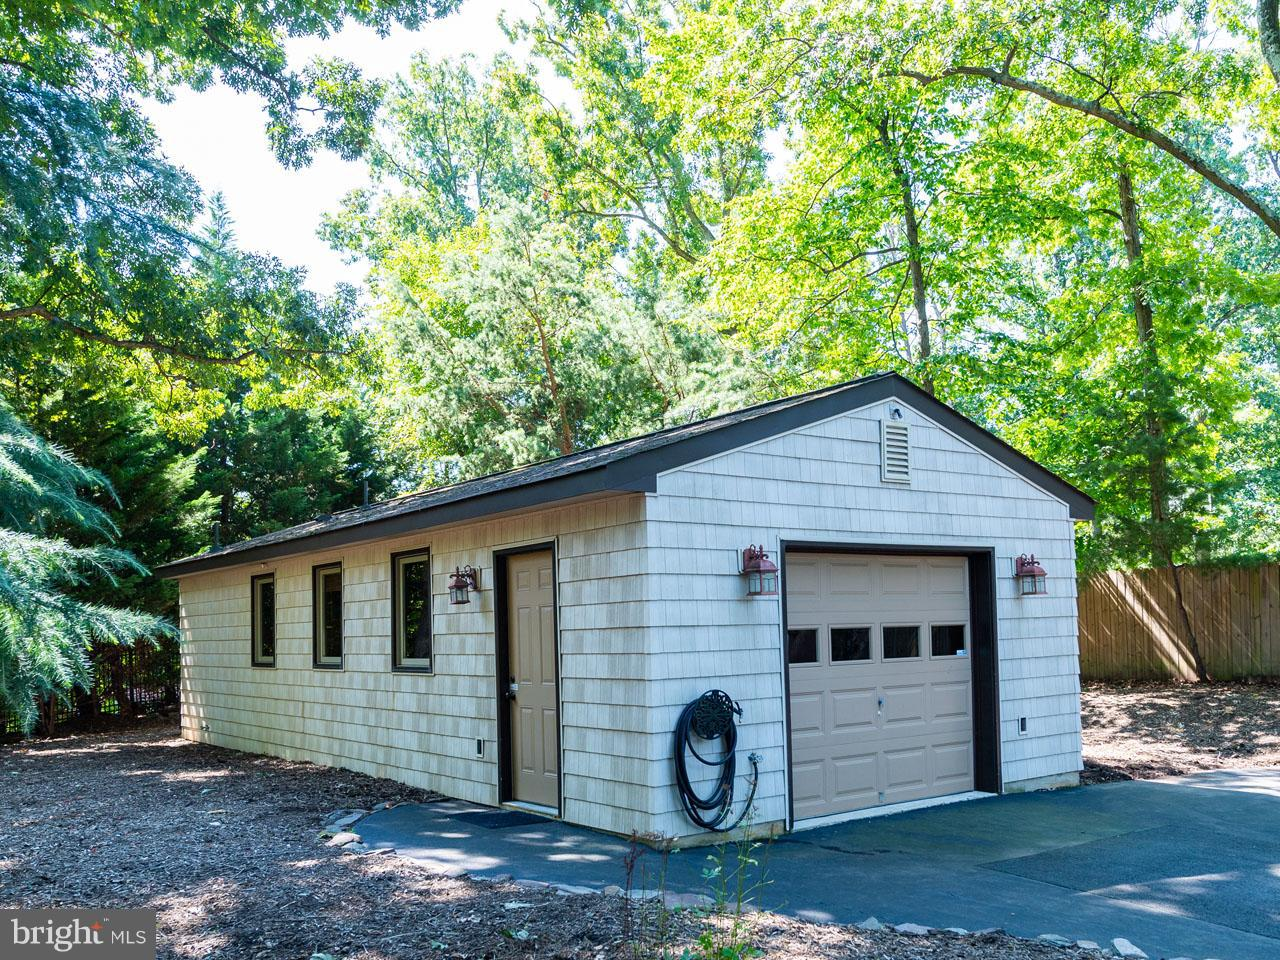 1002303700-300502418967-2021-07-22-03-27-22  |   | Alexandria Delaware Real Estate For Sale | MLS# 1002303700  - Best of Northern Virginia